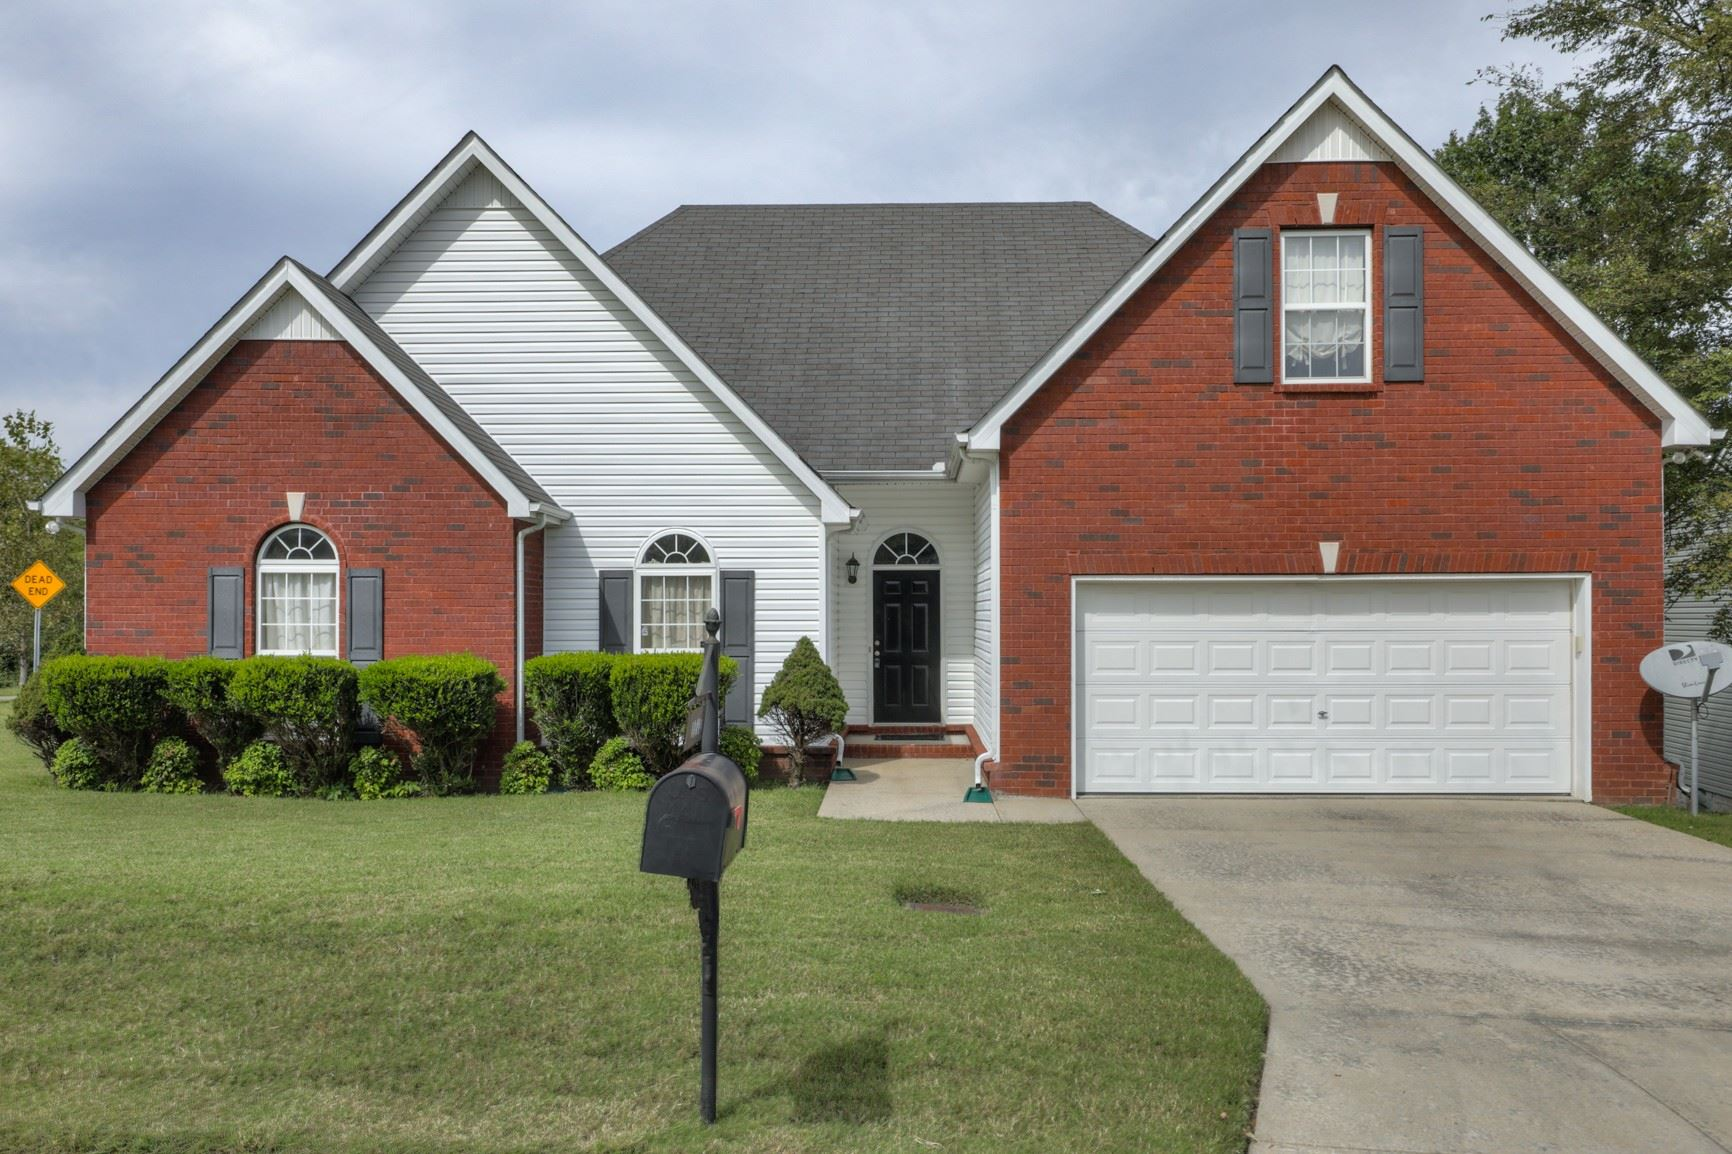 4049 Pineorchard Pl, Antioch, TN 37013 - MLS#: 2192463